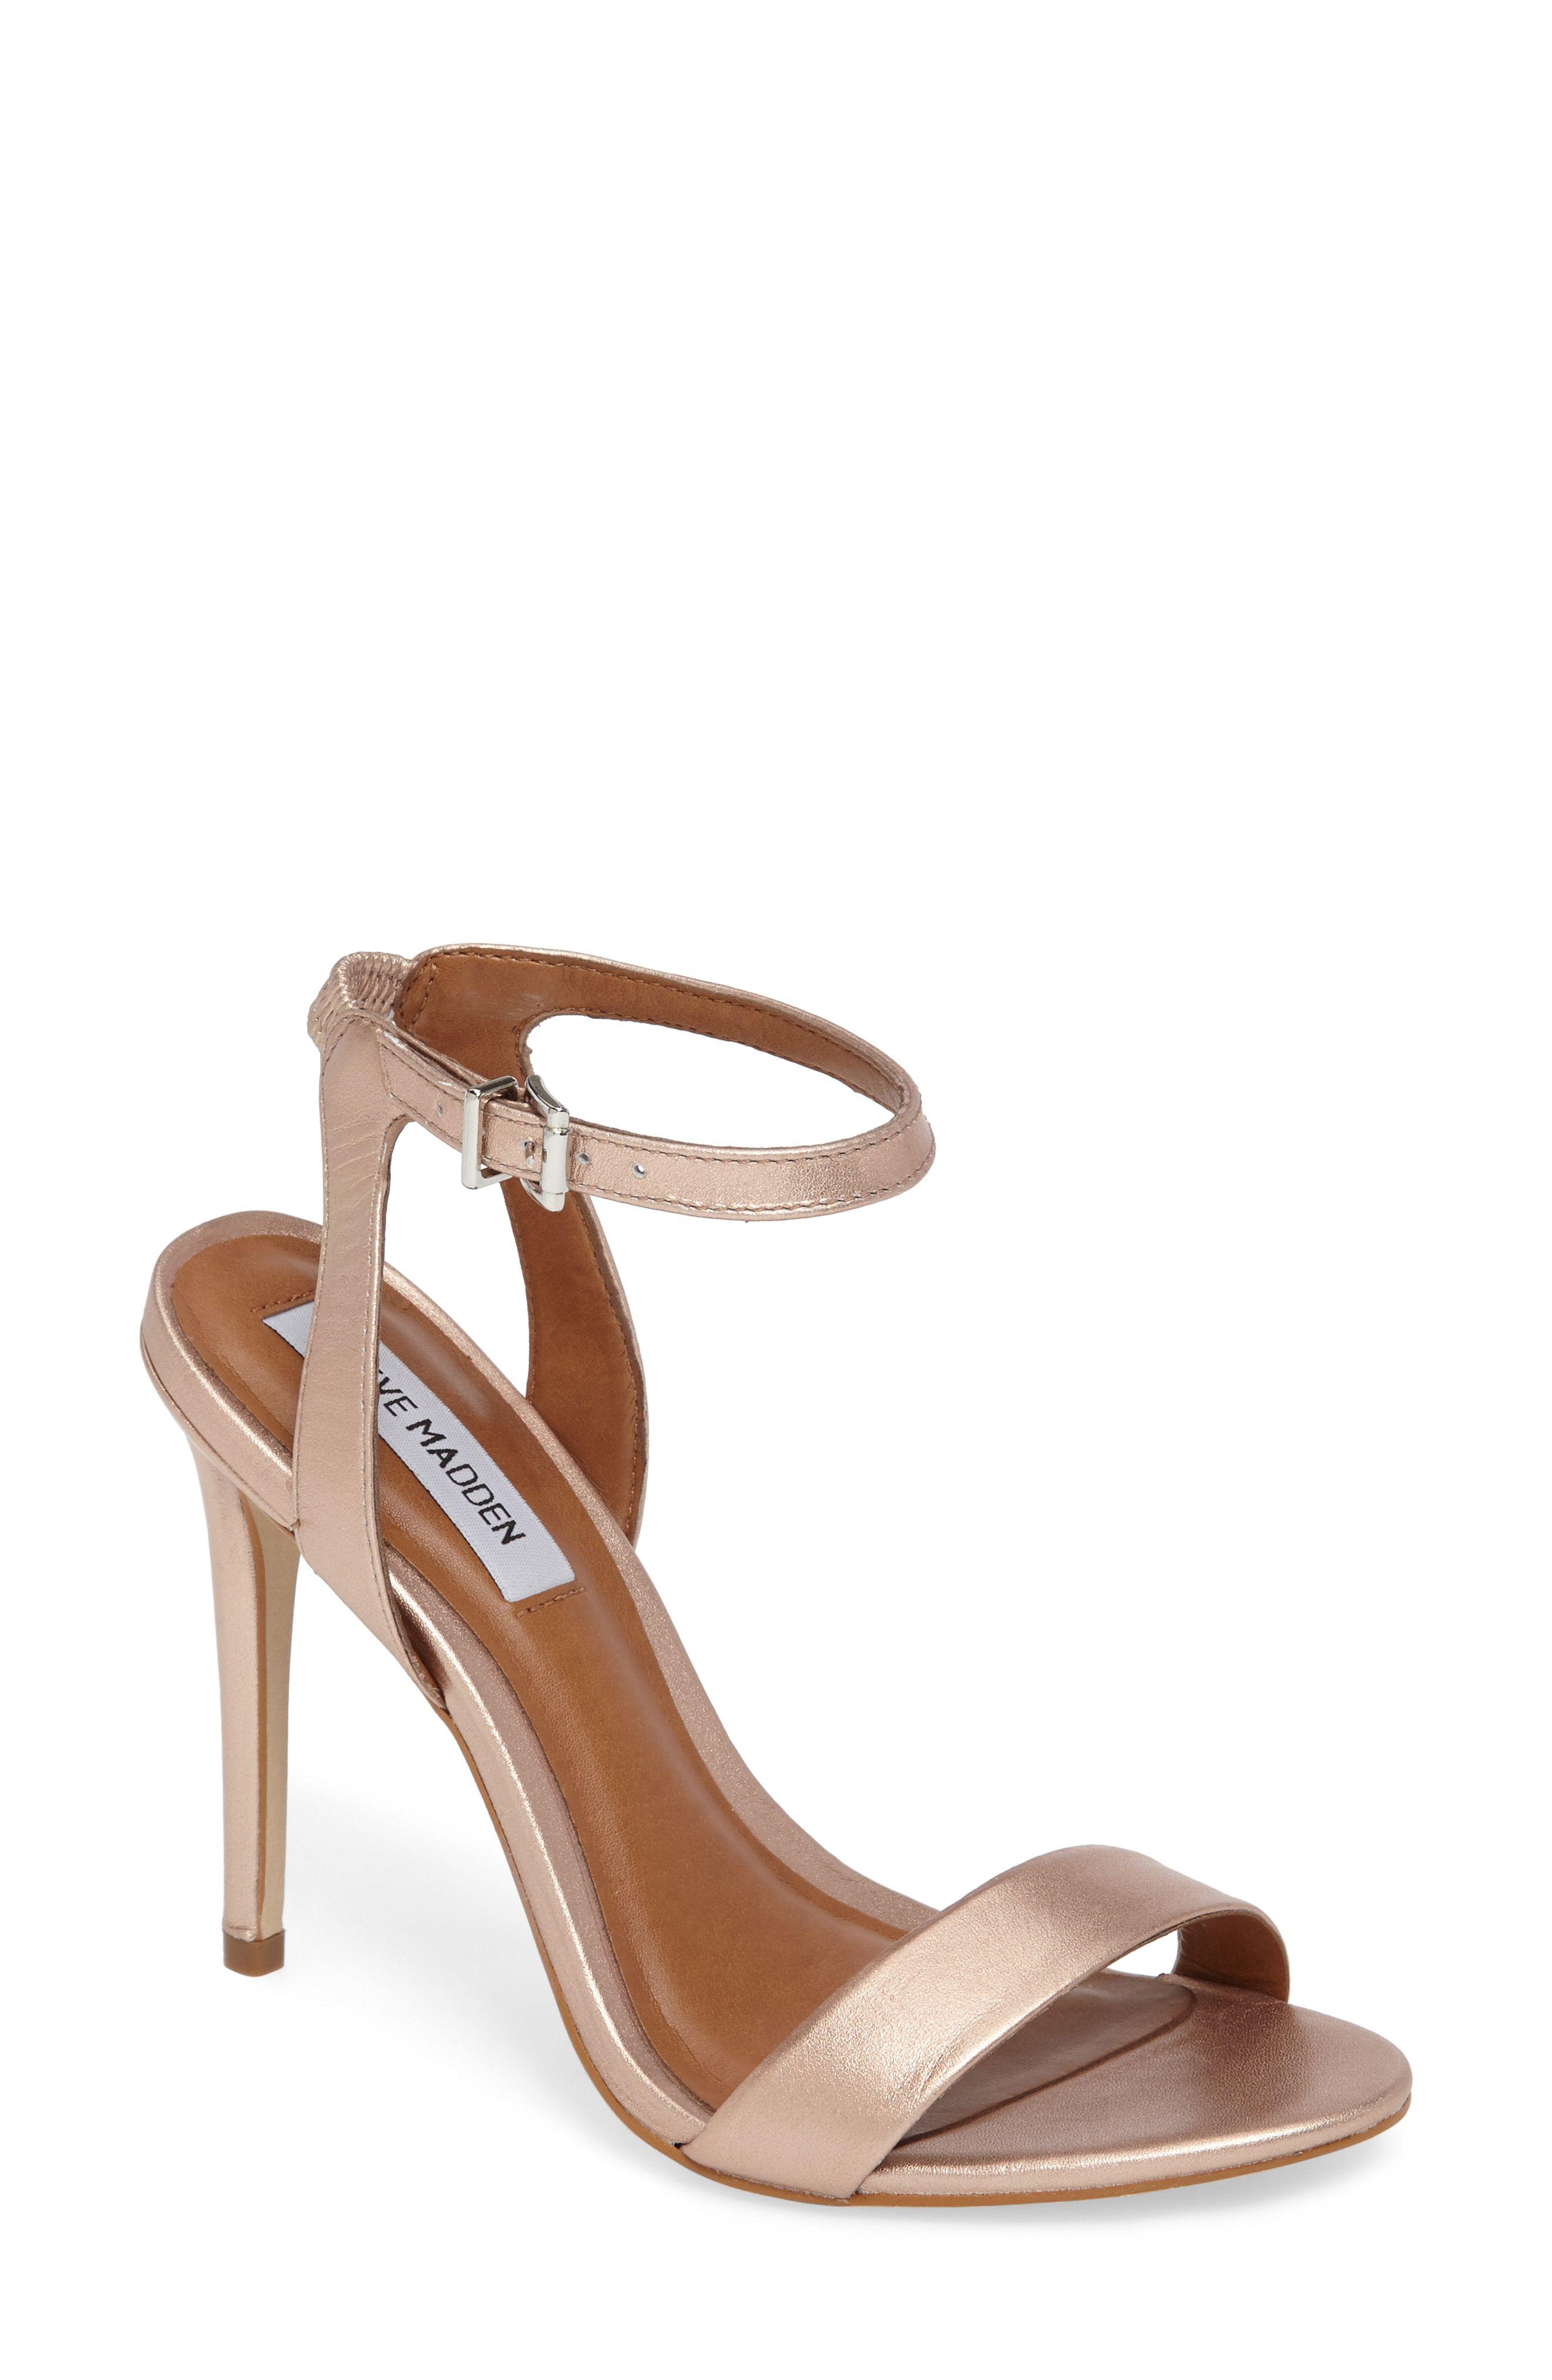 357ad6d14d6 Nude bridal Heels - Landen Ankle Strap Sandal   Neutral Weddings ...